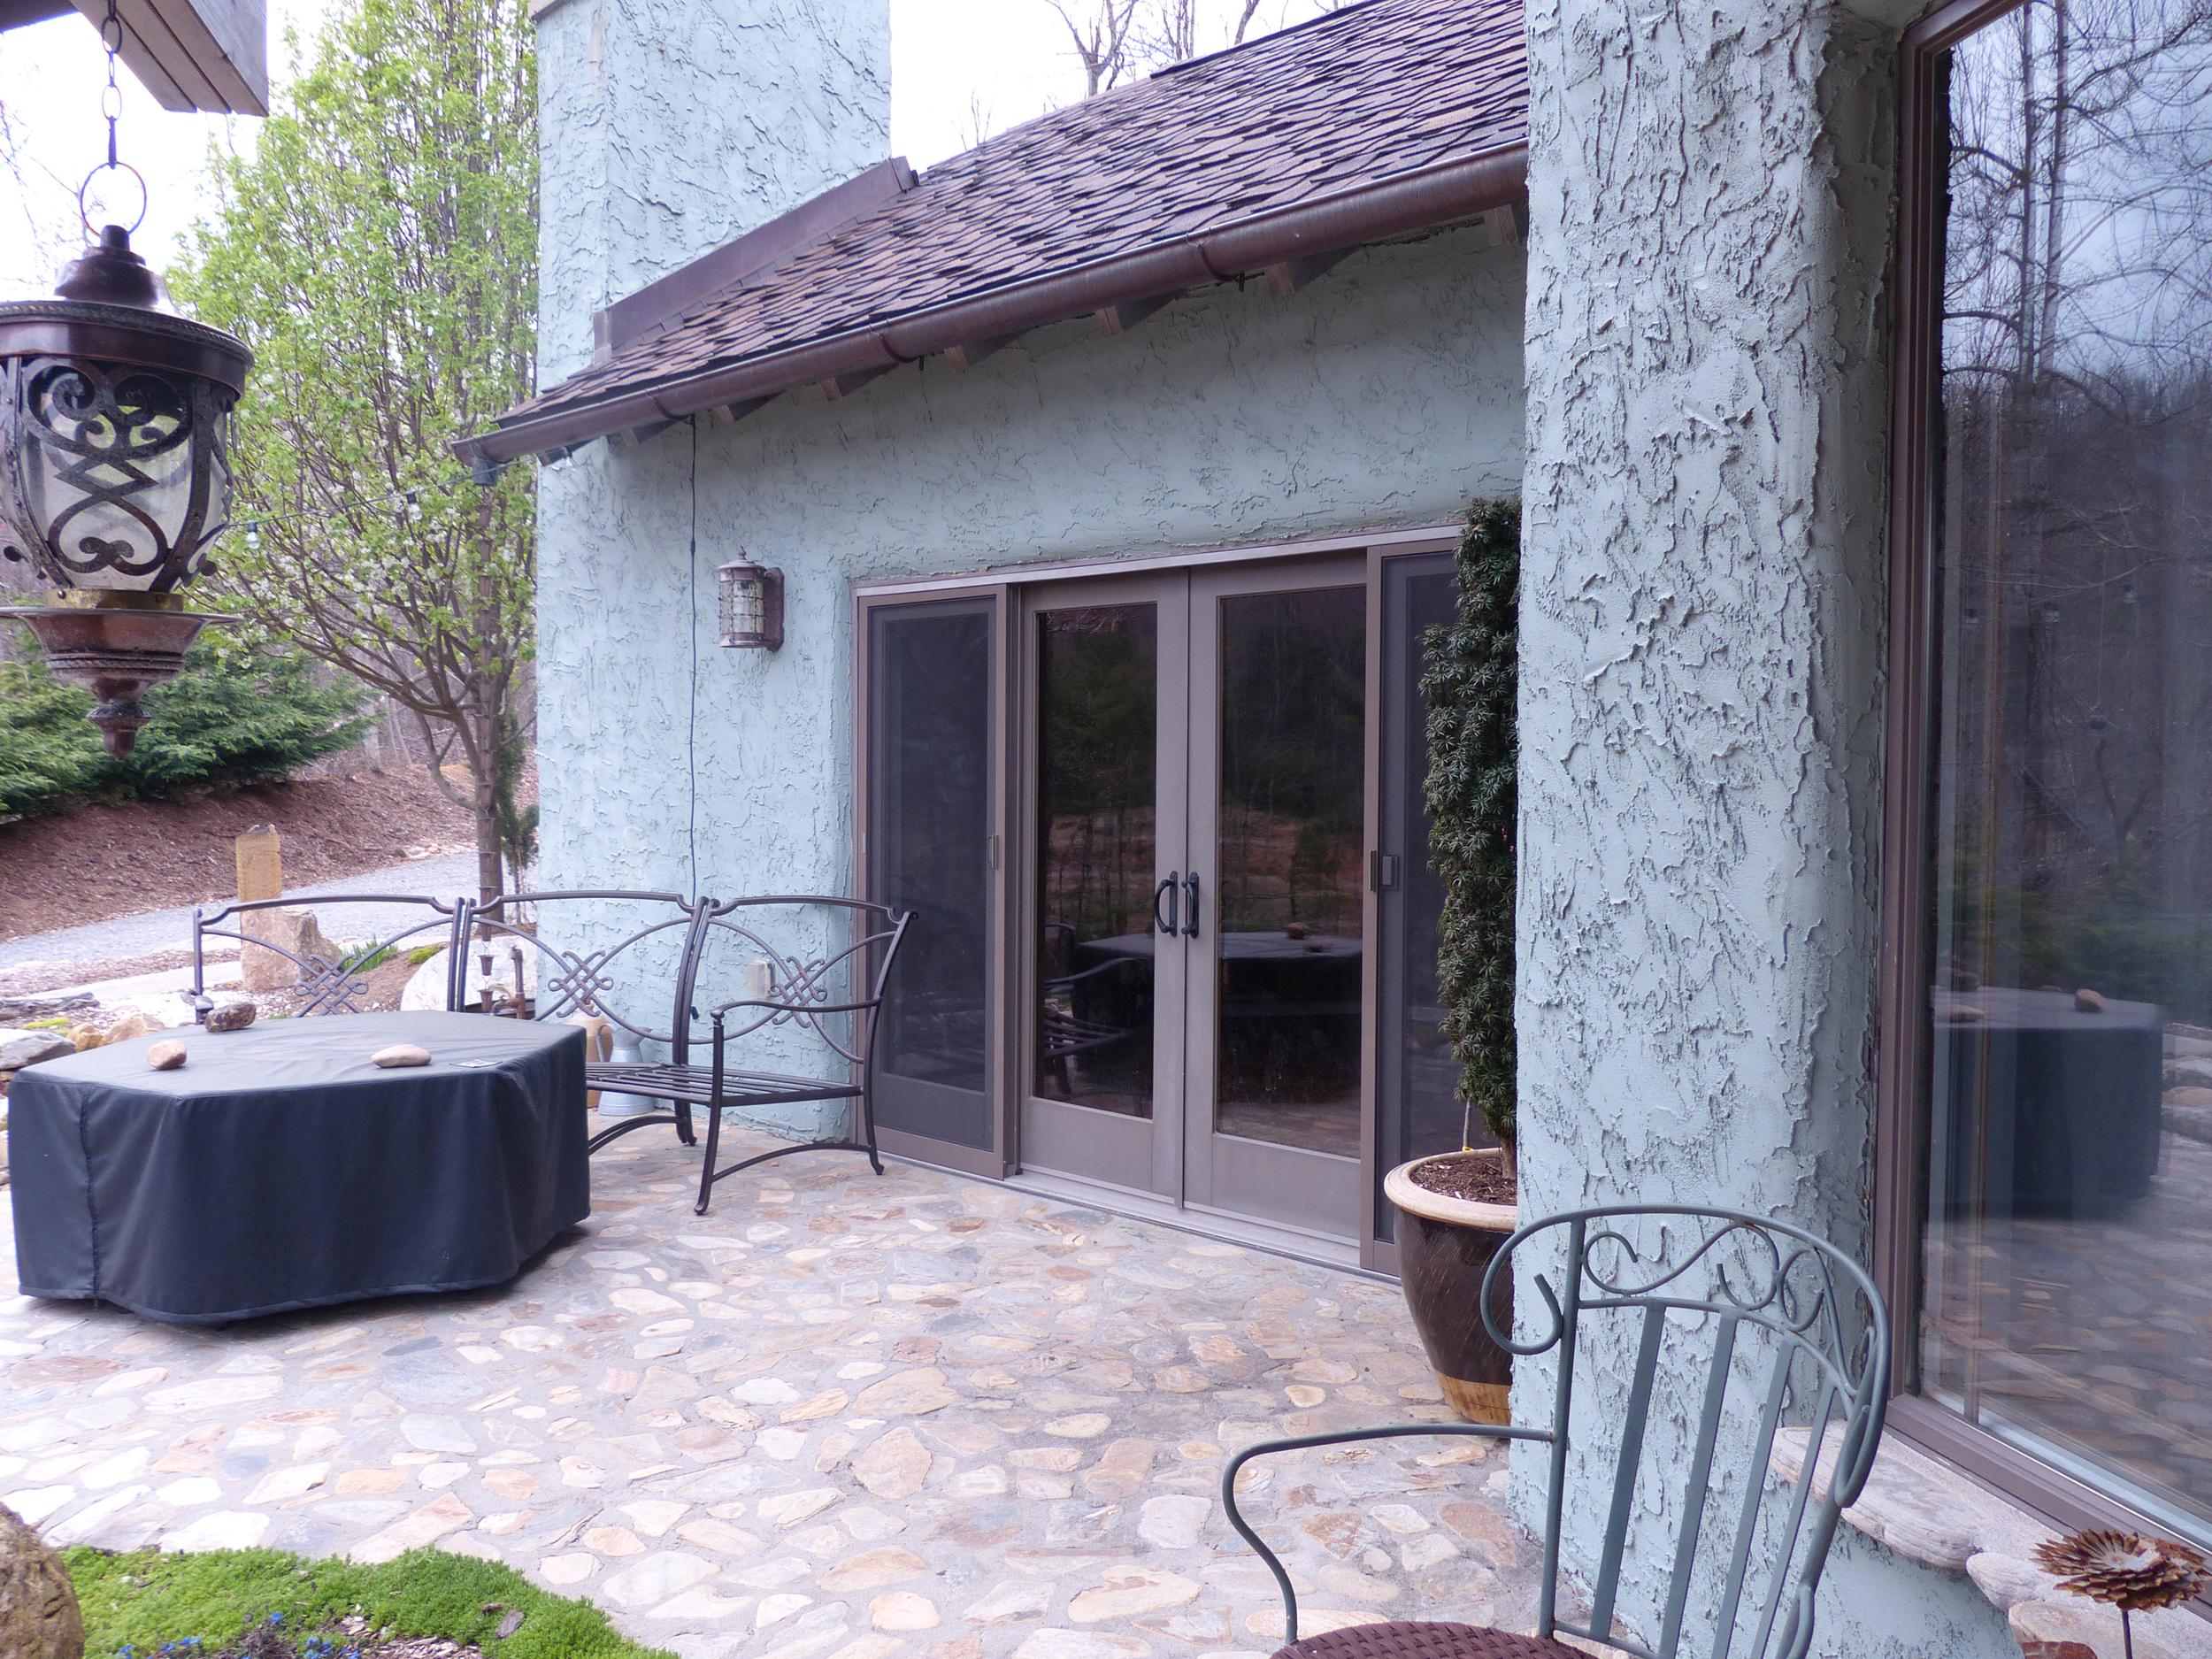 Beautiful low maintenance habitat built by Tim Carter using insulation board wall panel construction.